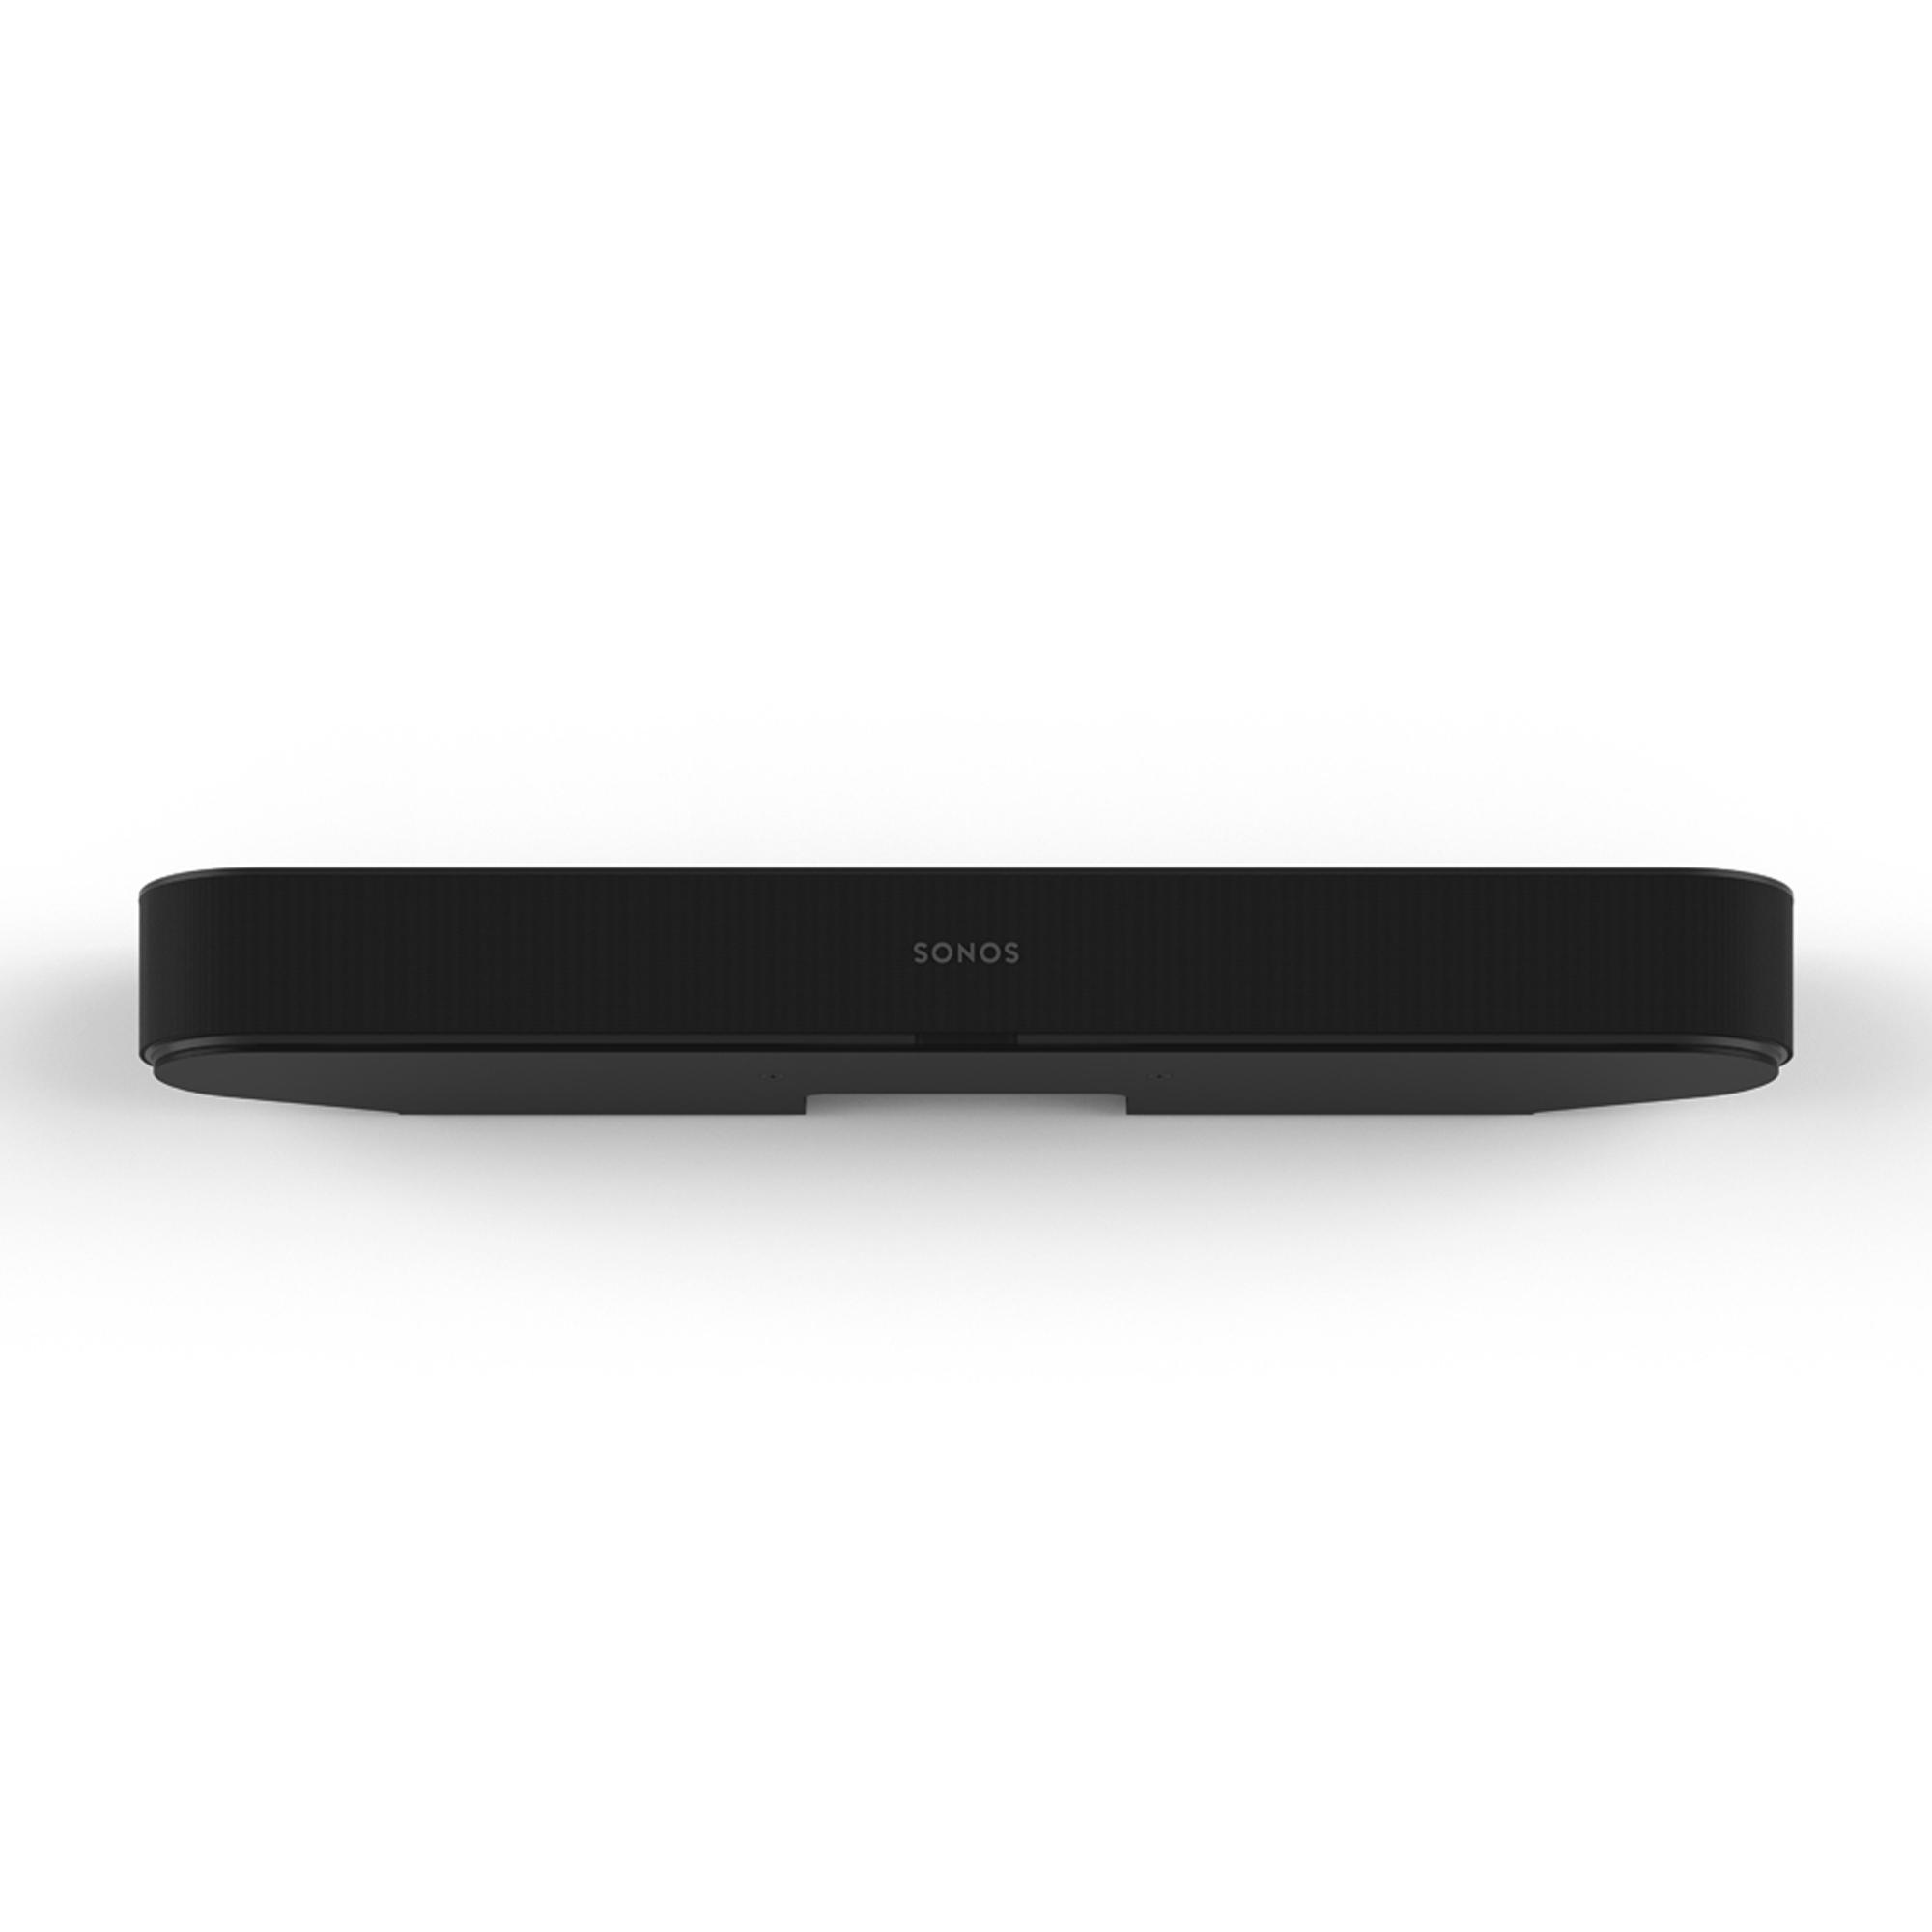 Sonos Beam Smart Soundbar with Amazon Alexa